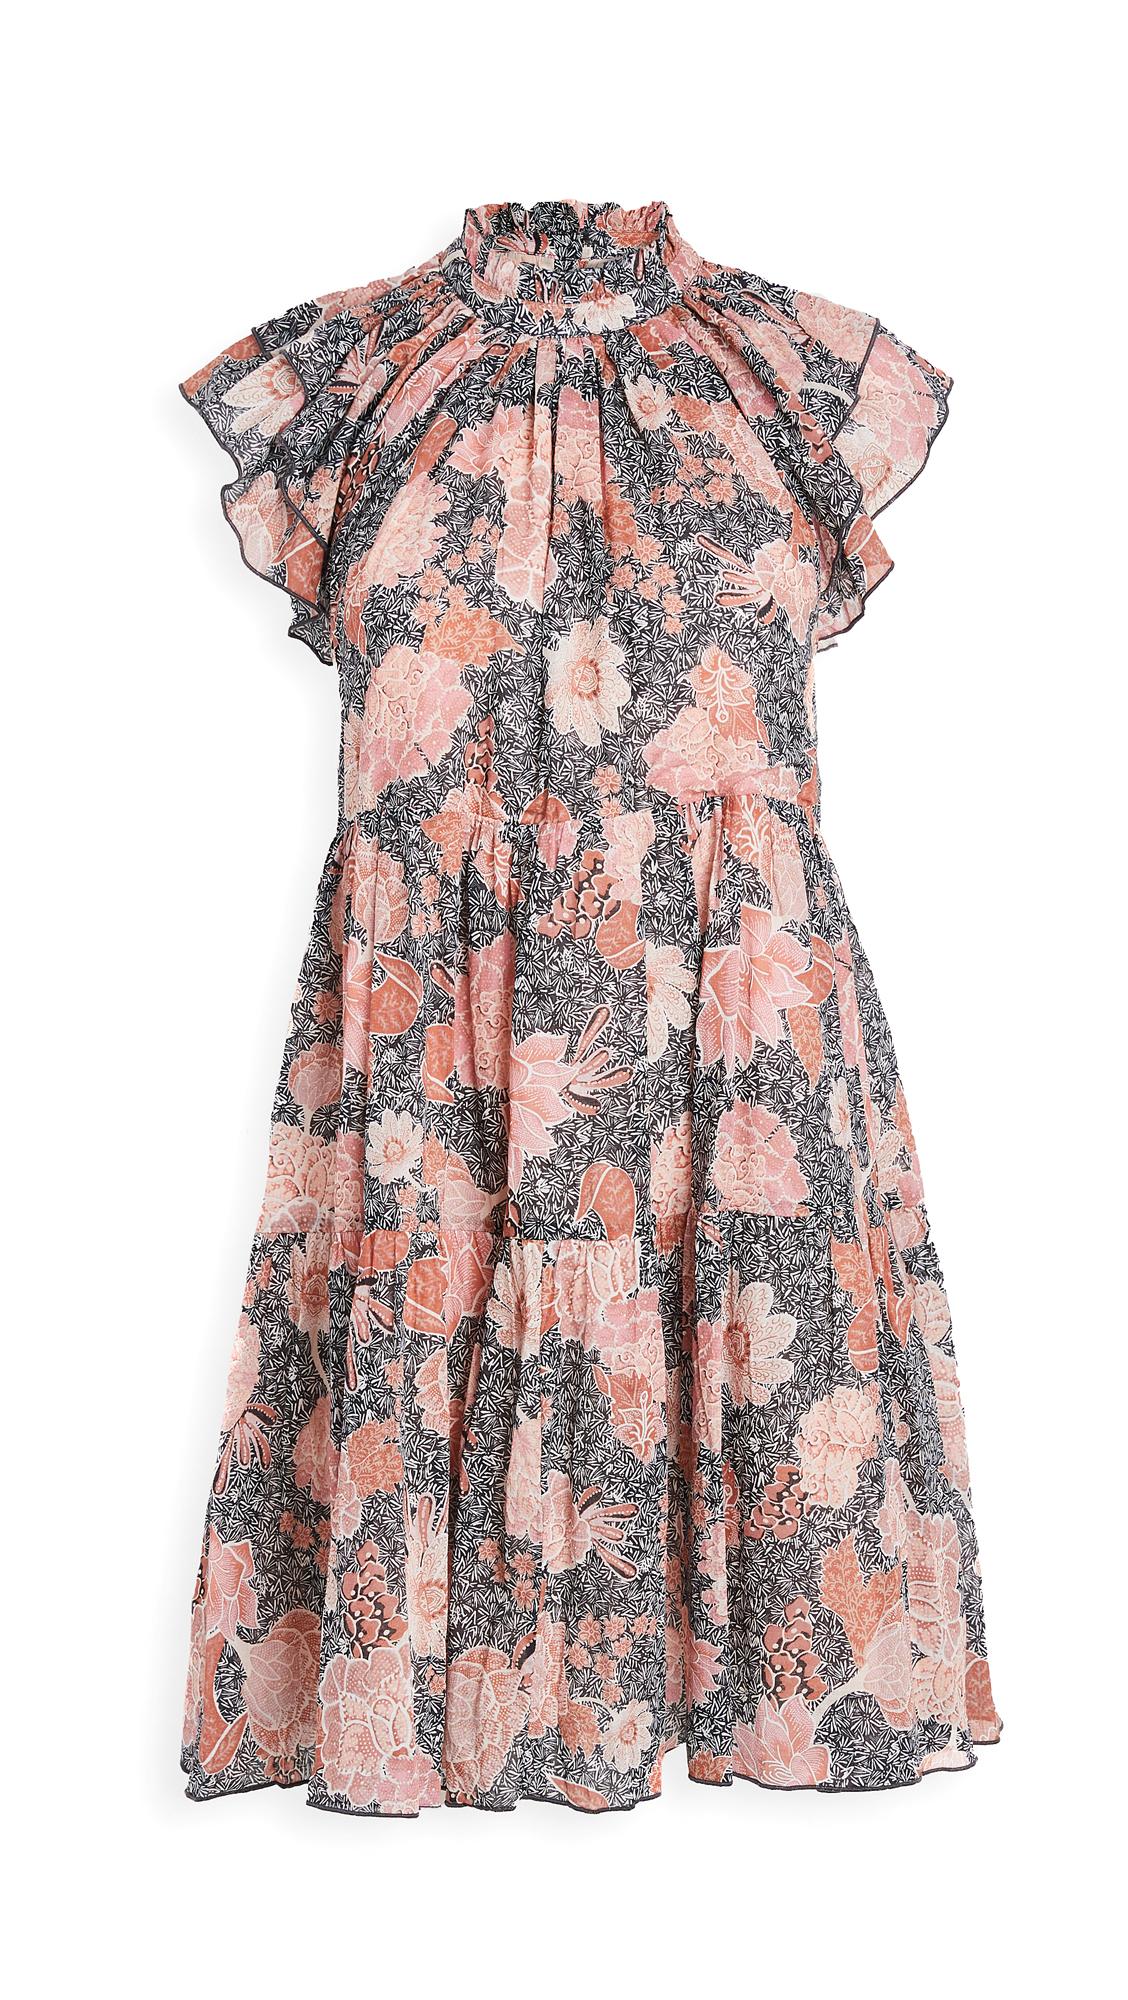 Photo of Steele Lori Dress - shop Steele Clothing, Dresses online